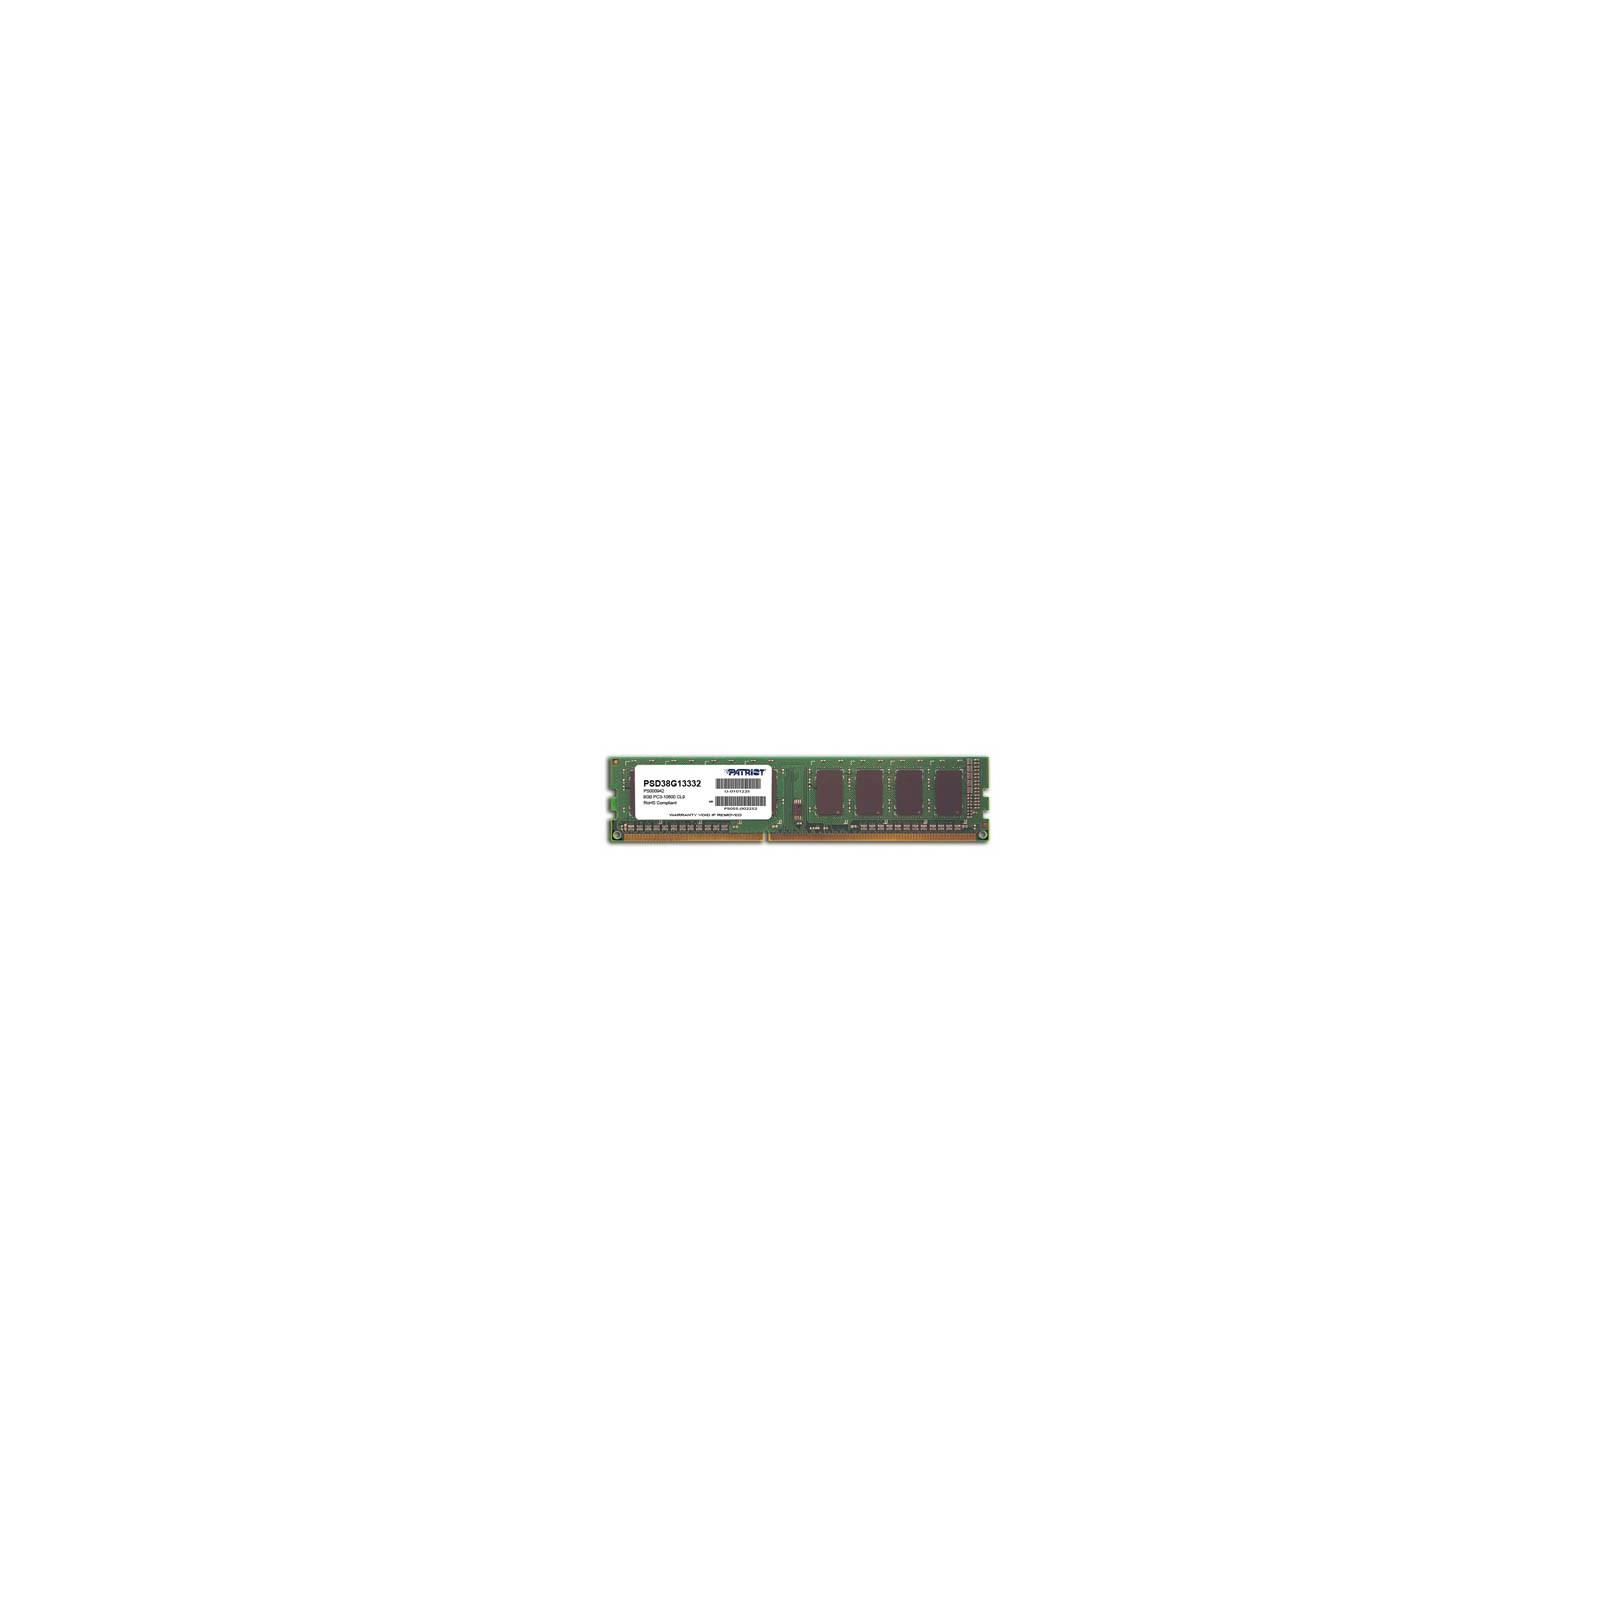 Модуль памяти для компьютера DDR3 8GB 1333 MHz Patriot (PSD38G13332)